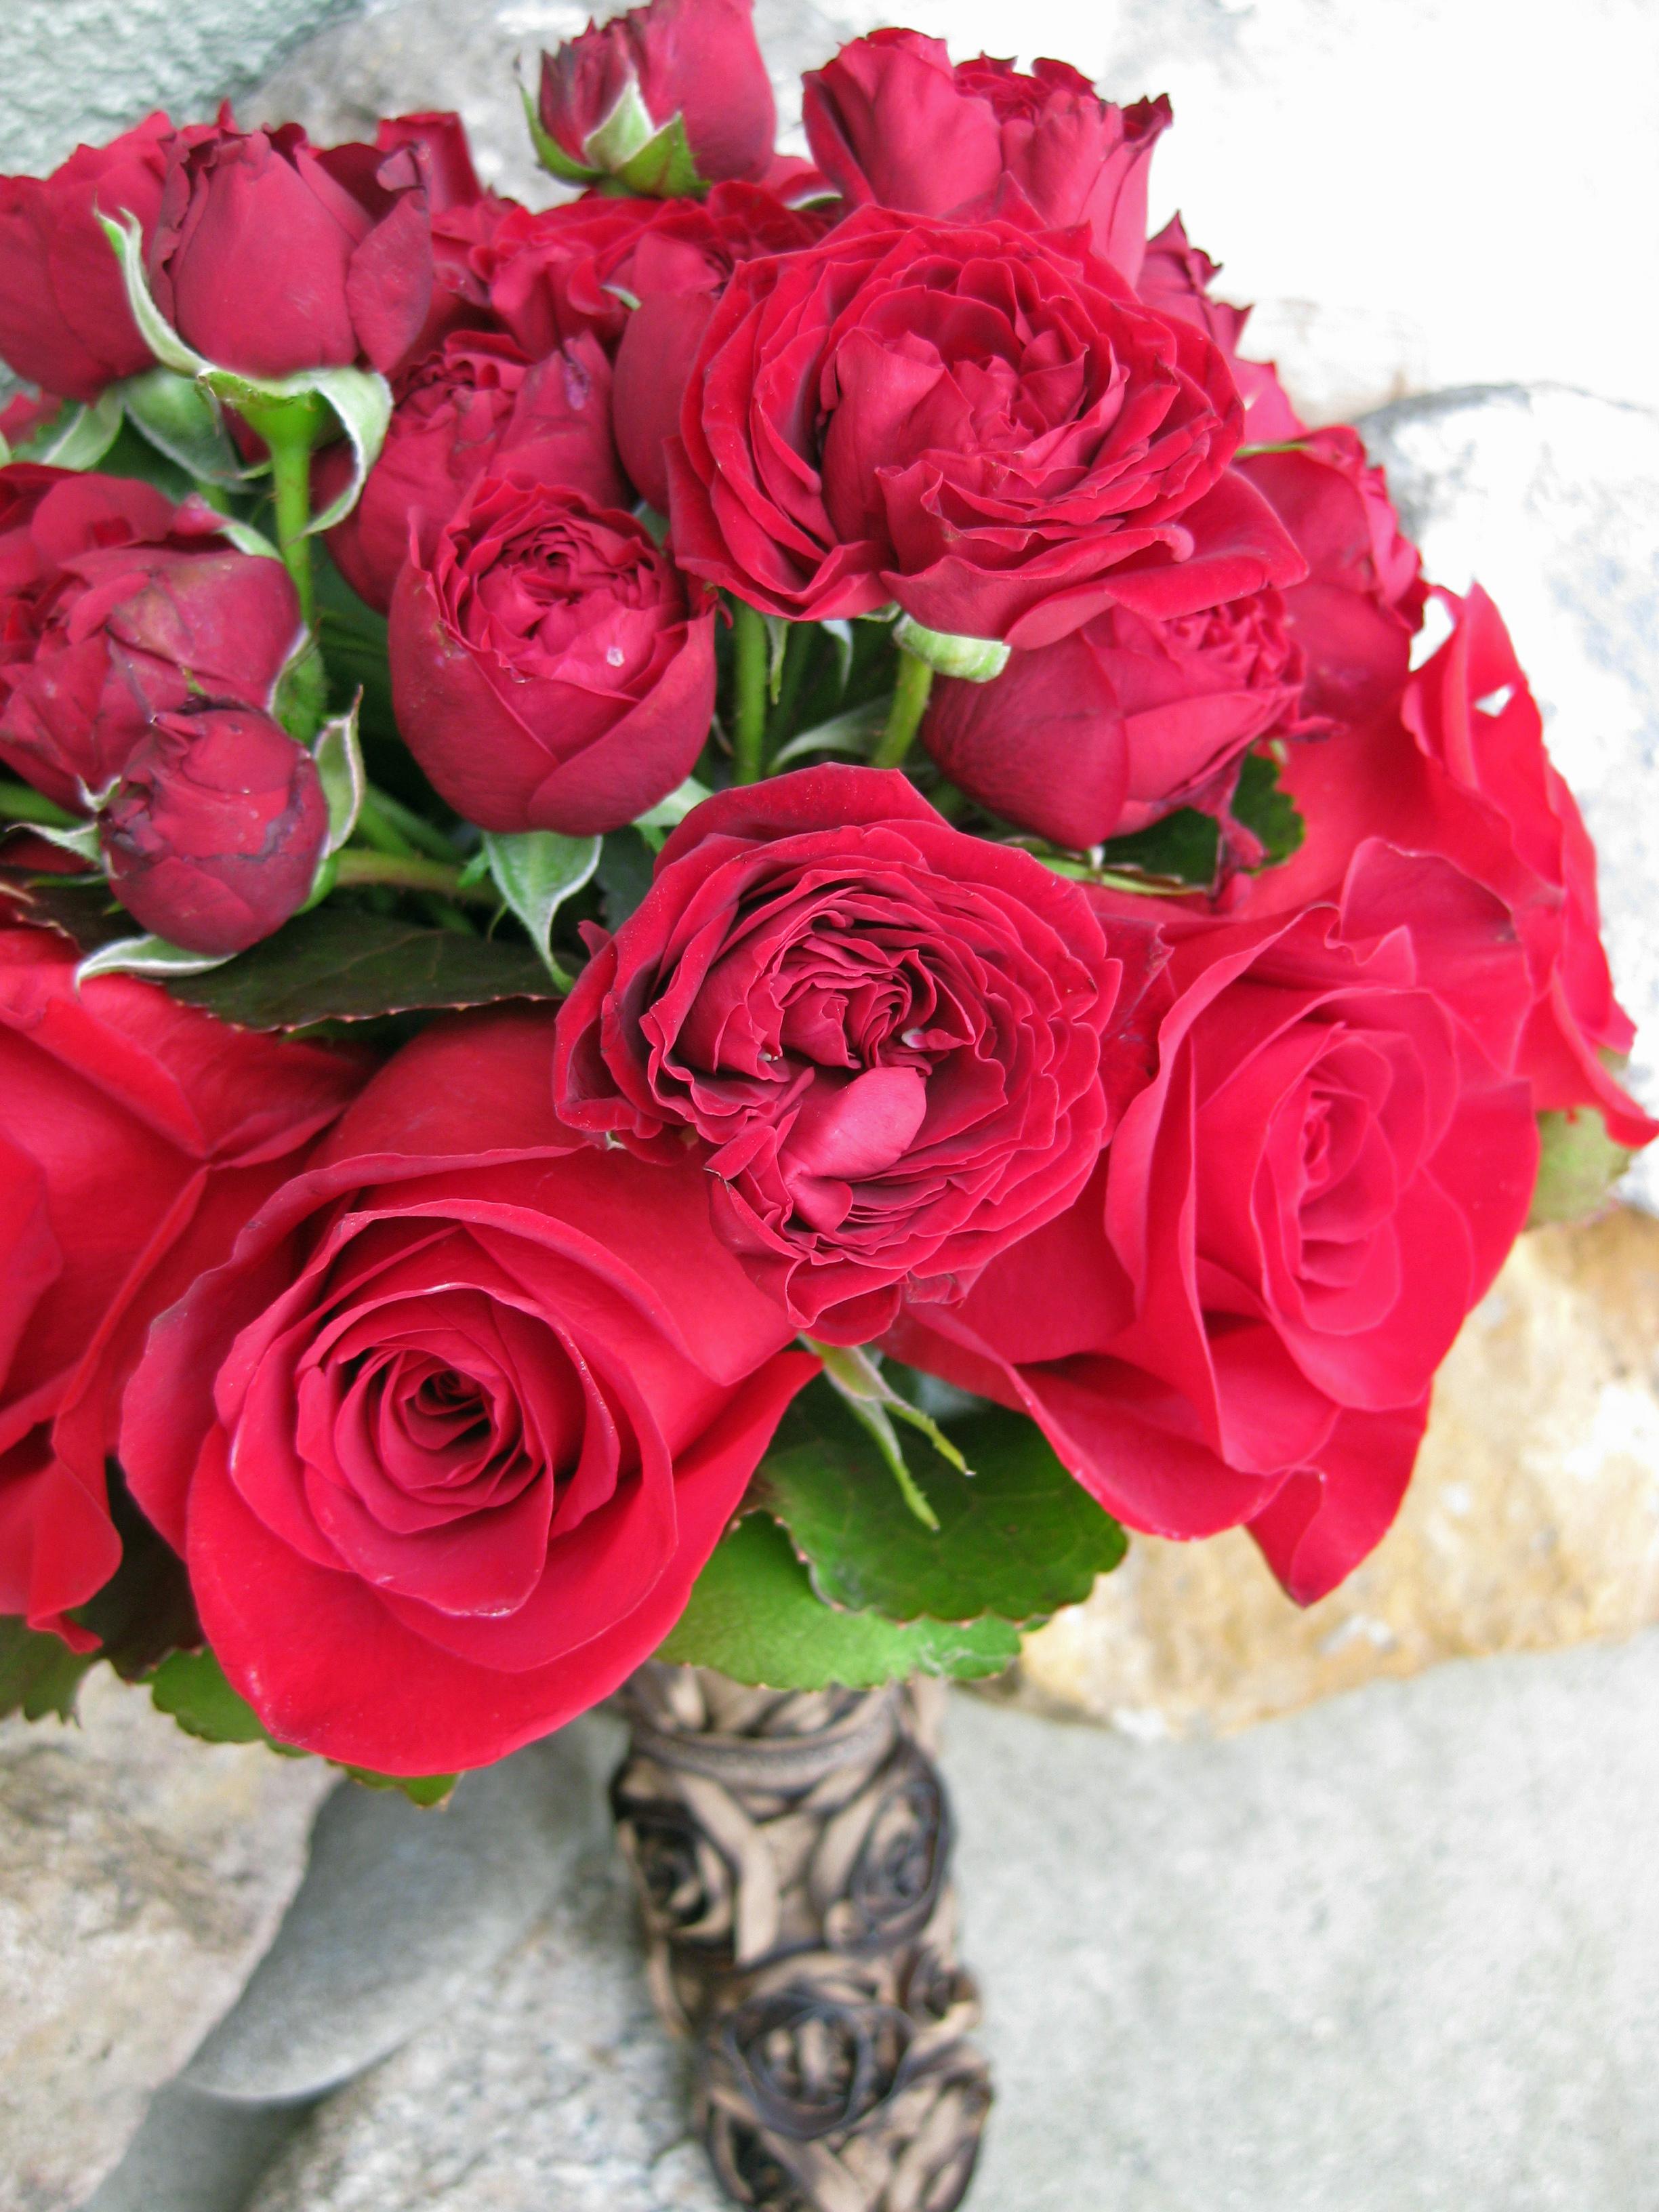 Roses In Garden: Floral Design By Jacqueline